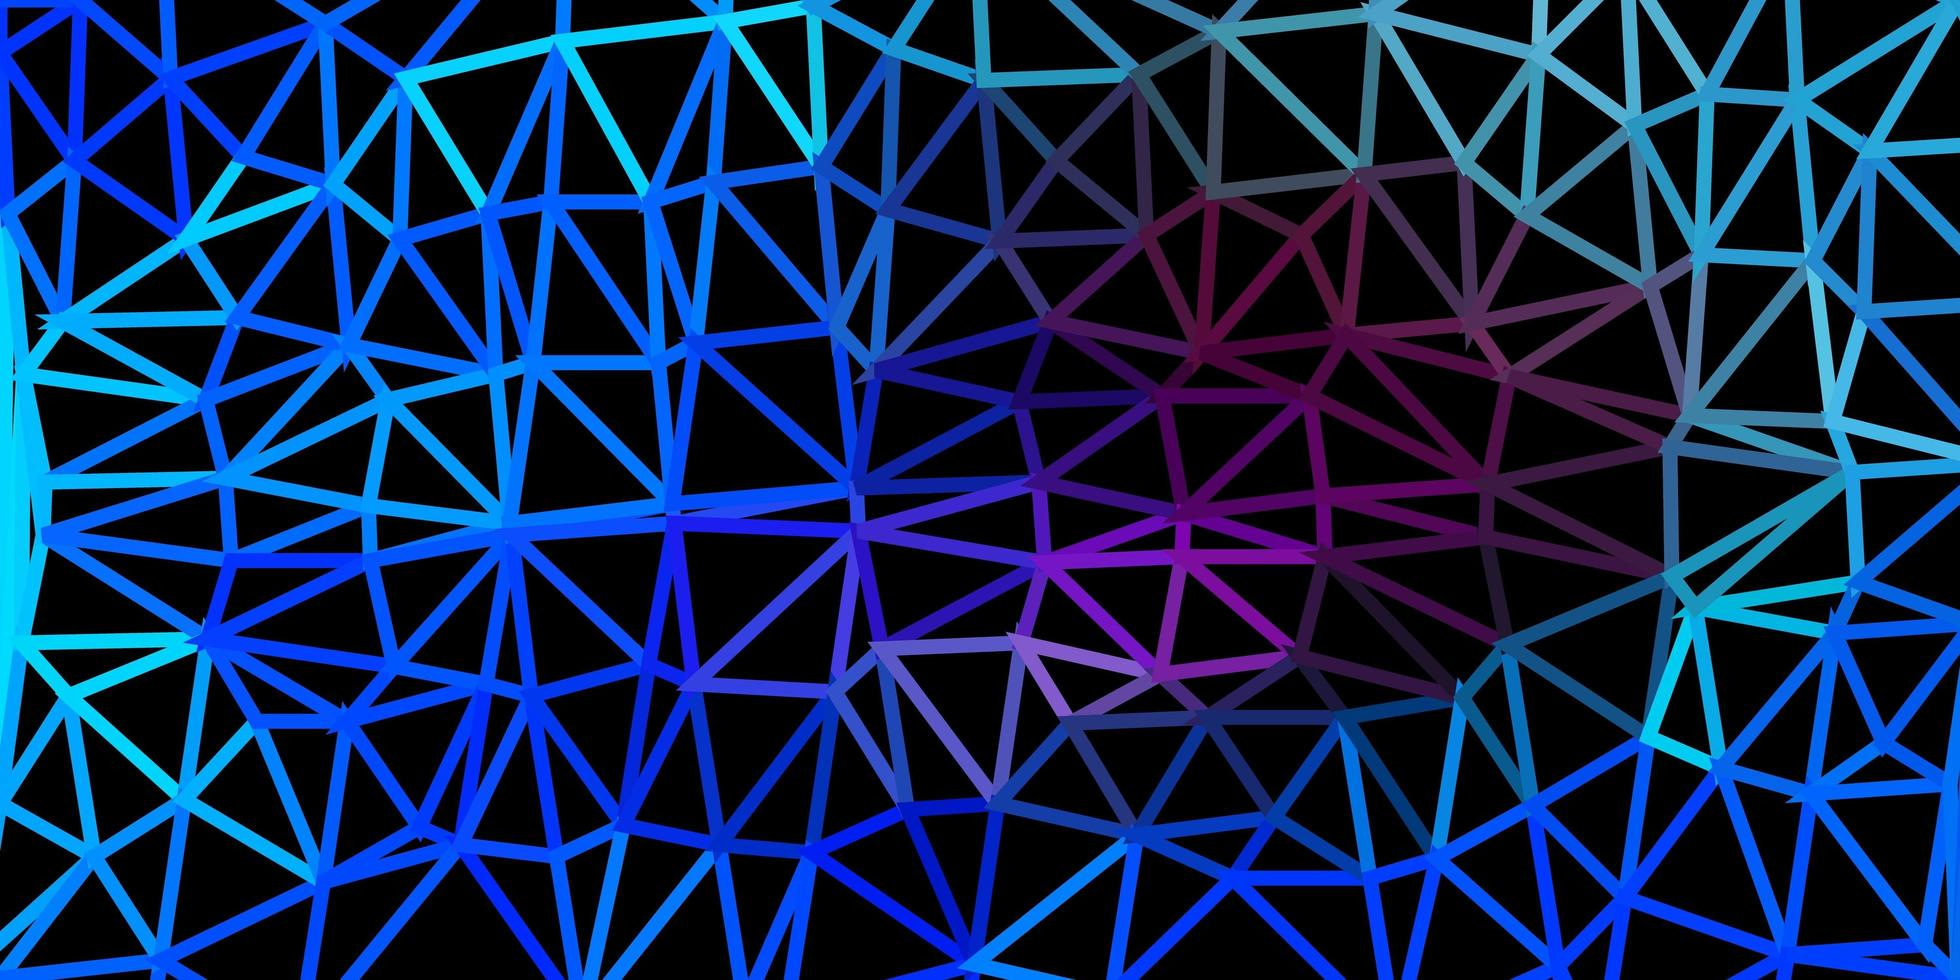 mörkrosa, blå vektor triangel mosaik bakgrund.